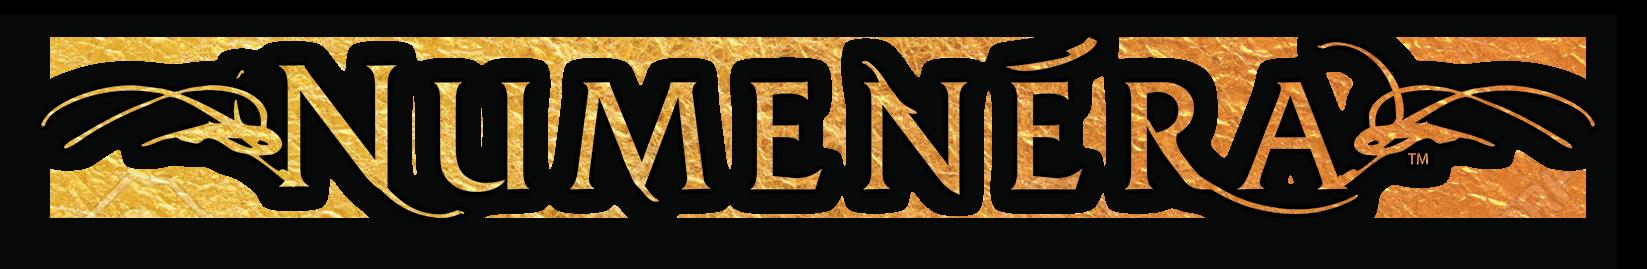 numenera-gold-foil-logo.png